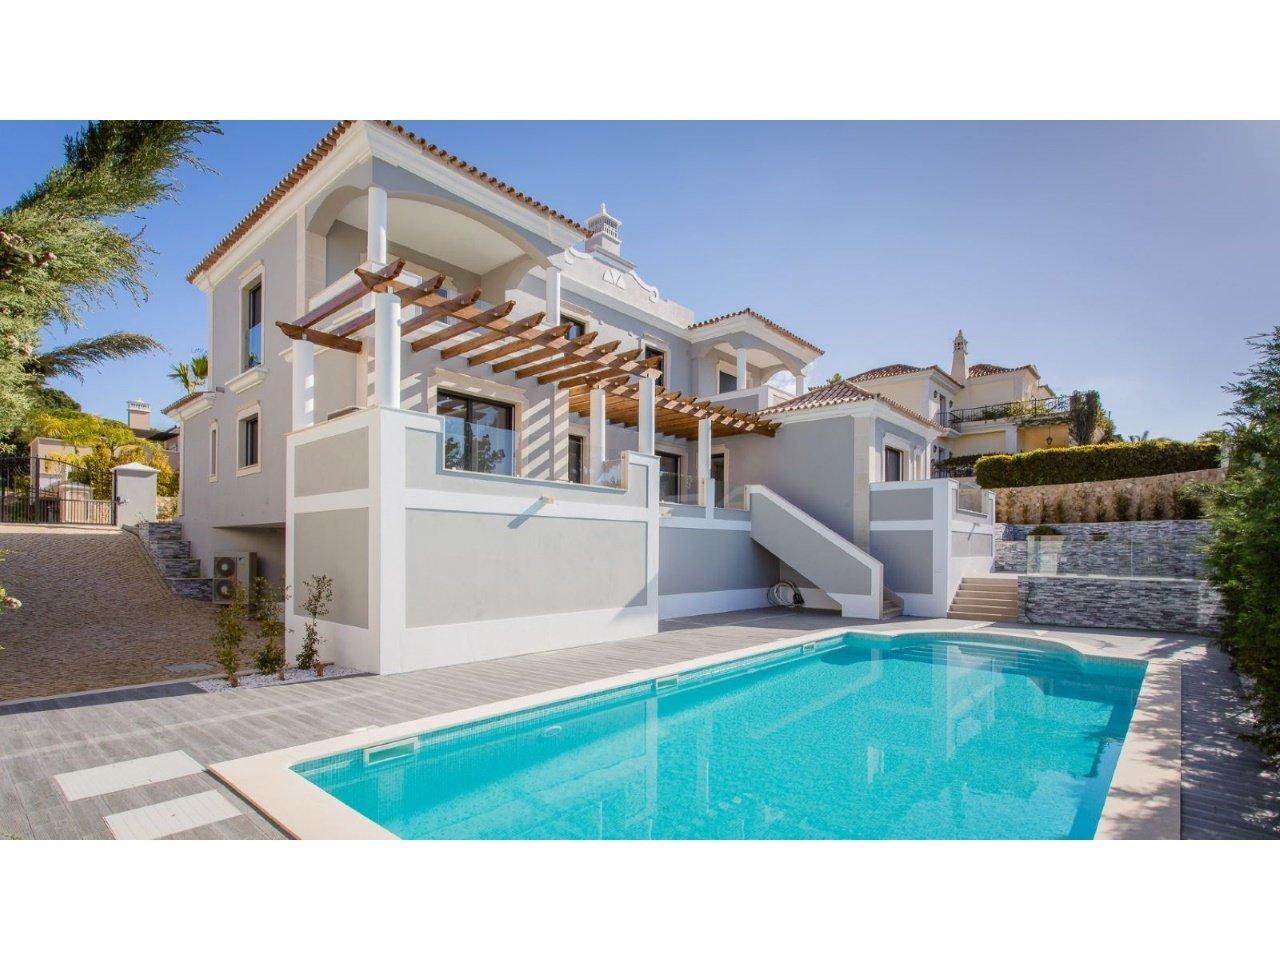 4 Bedroom Villa Quinta Do Lago, Central Algarve Ref: AVA50